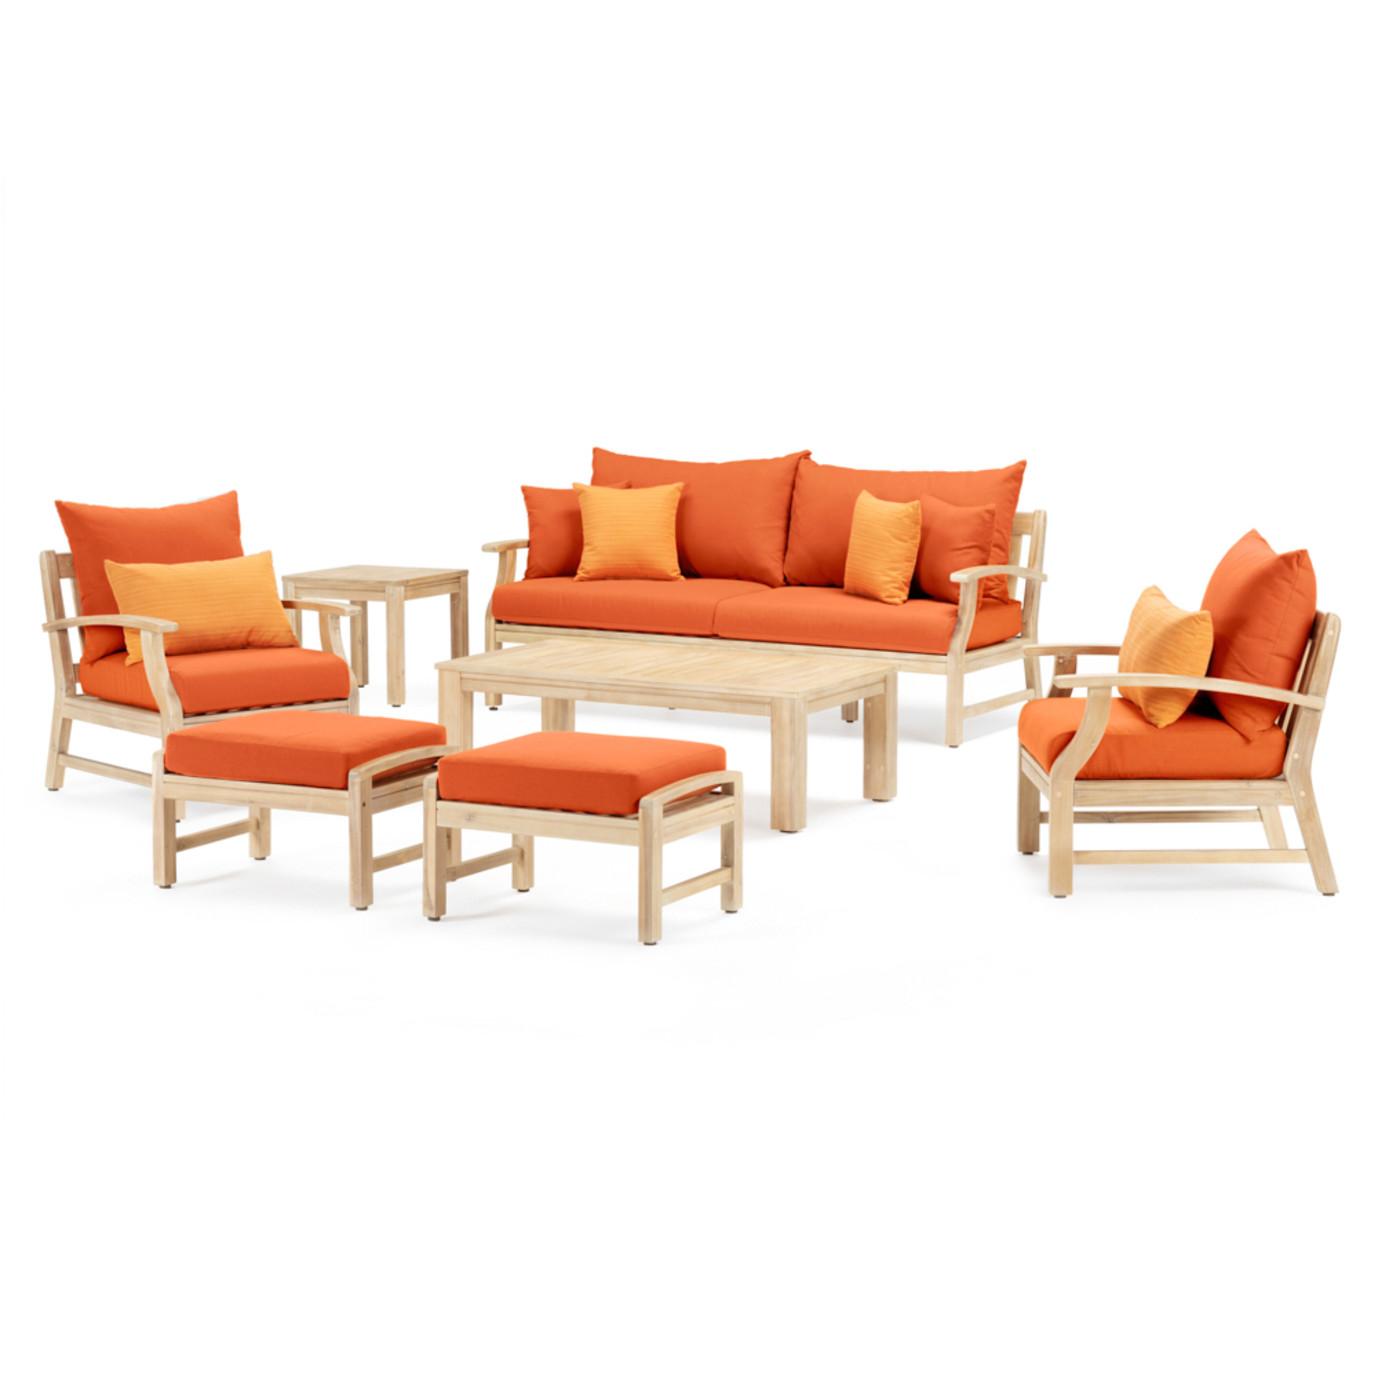 Kooper™ 7 Piece Outdoor Sofa & Club Chair Set - Tikka Orange